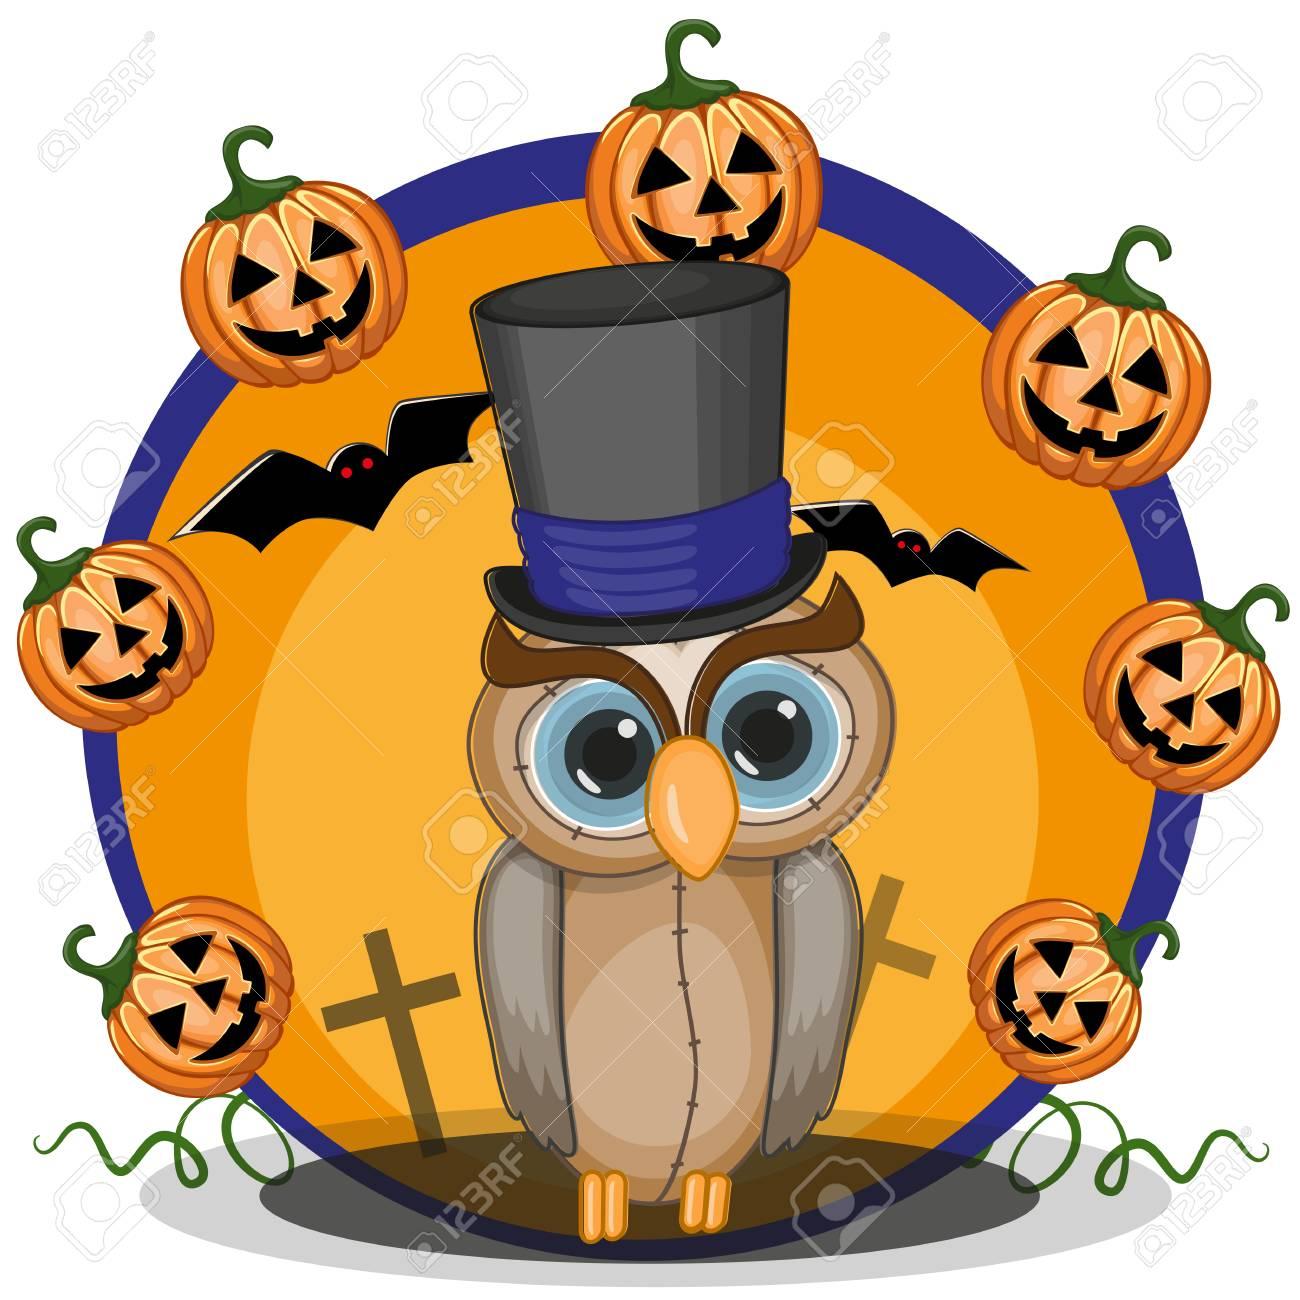 Halloween illustration of Cartoon Owl with pumpkin